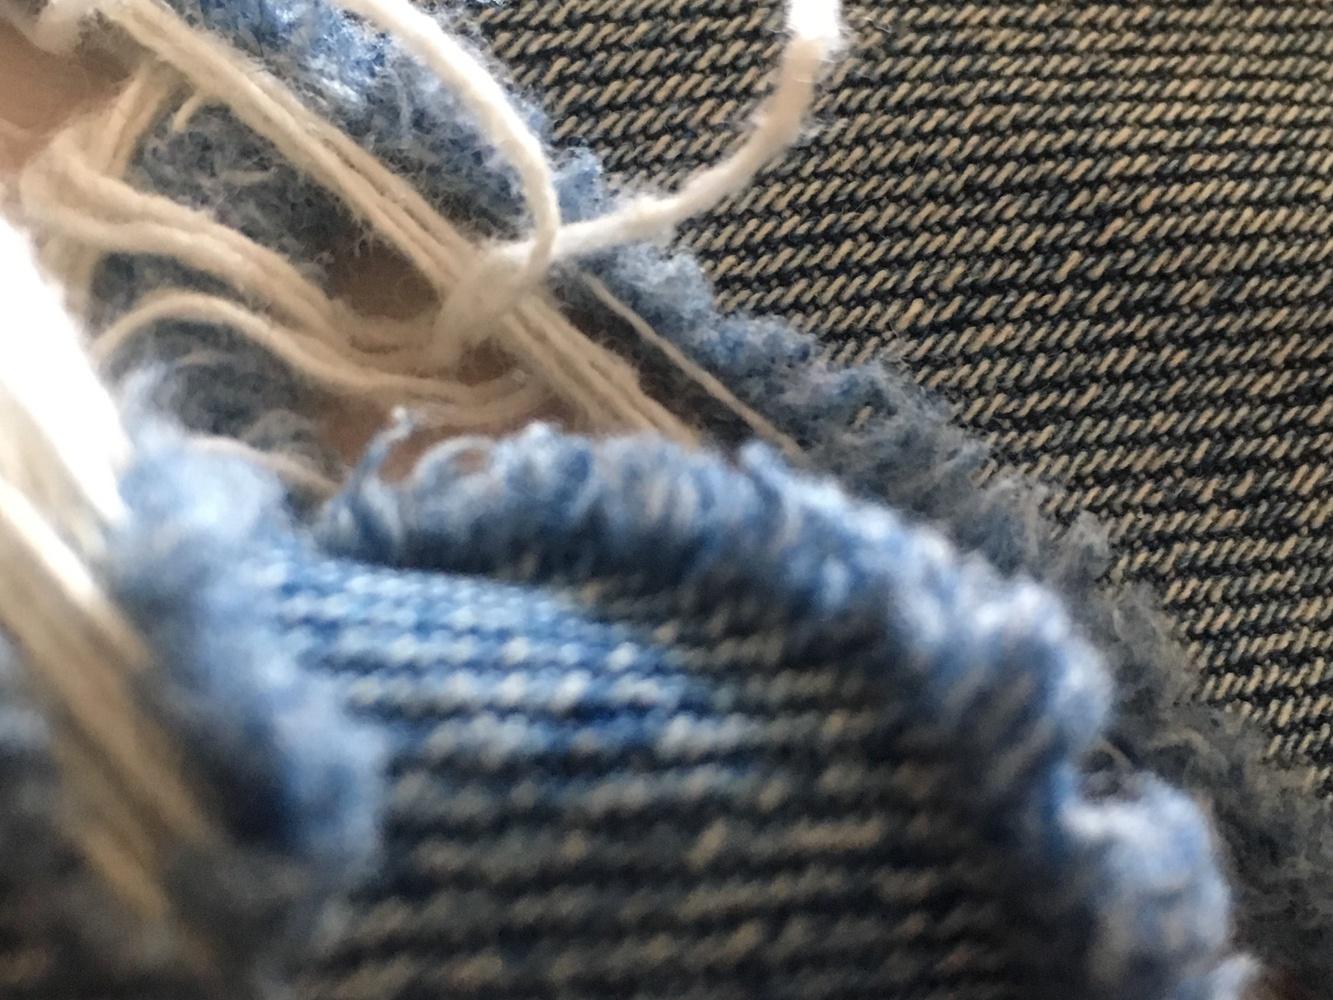 Cotton fill by Tomas Fredriksson